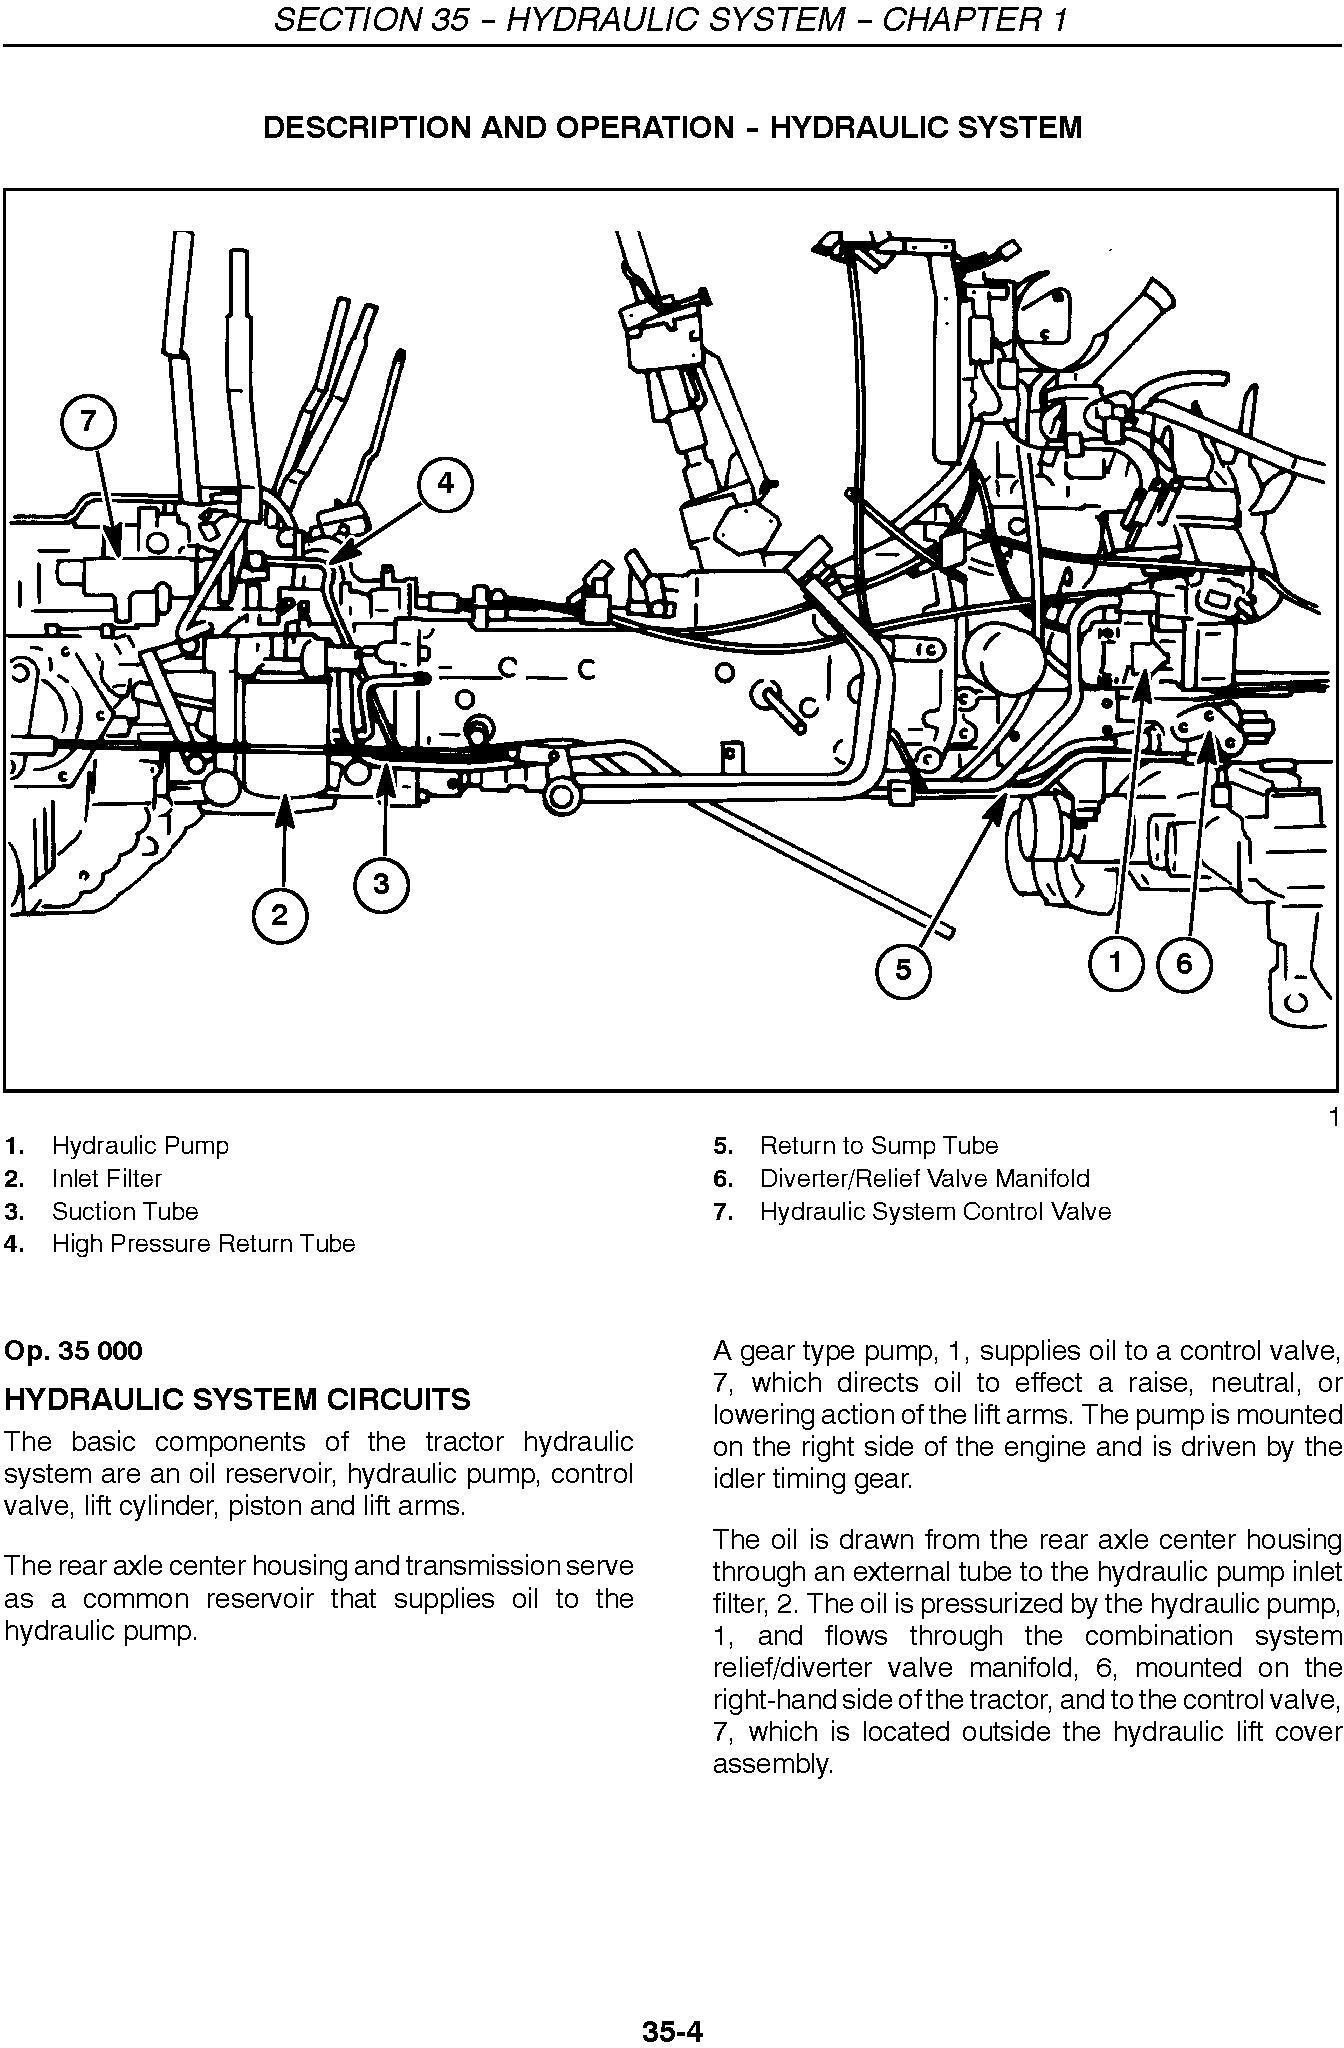 New Holland TC21DA, TC24DA Compact Tractor Complete Service Repair Manual - 3